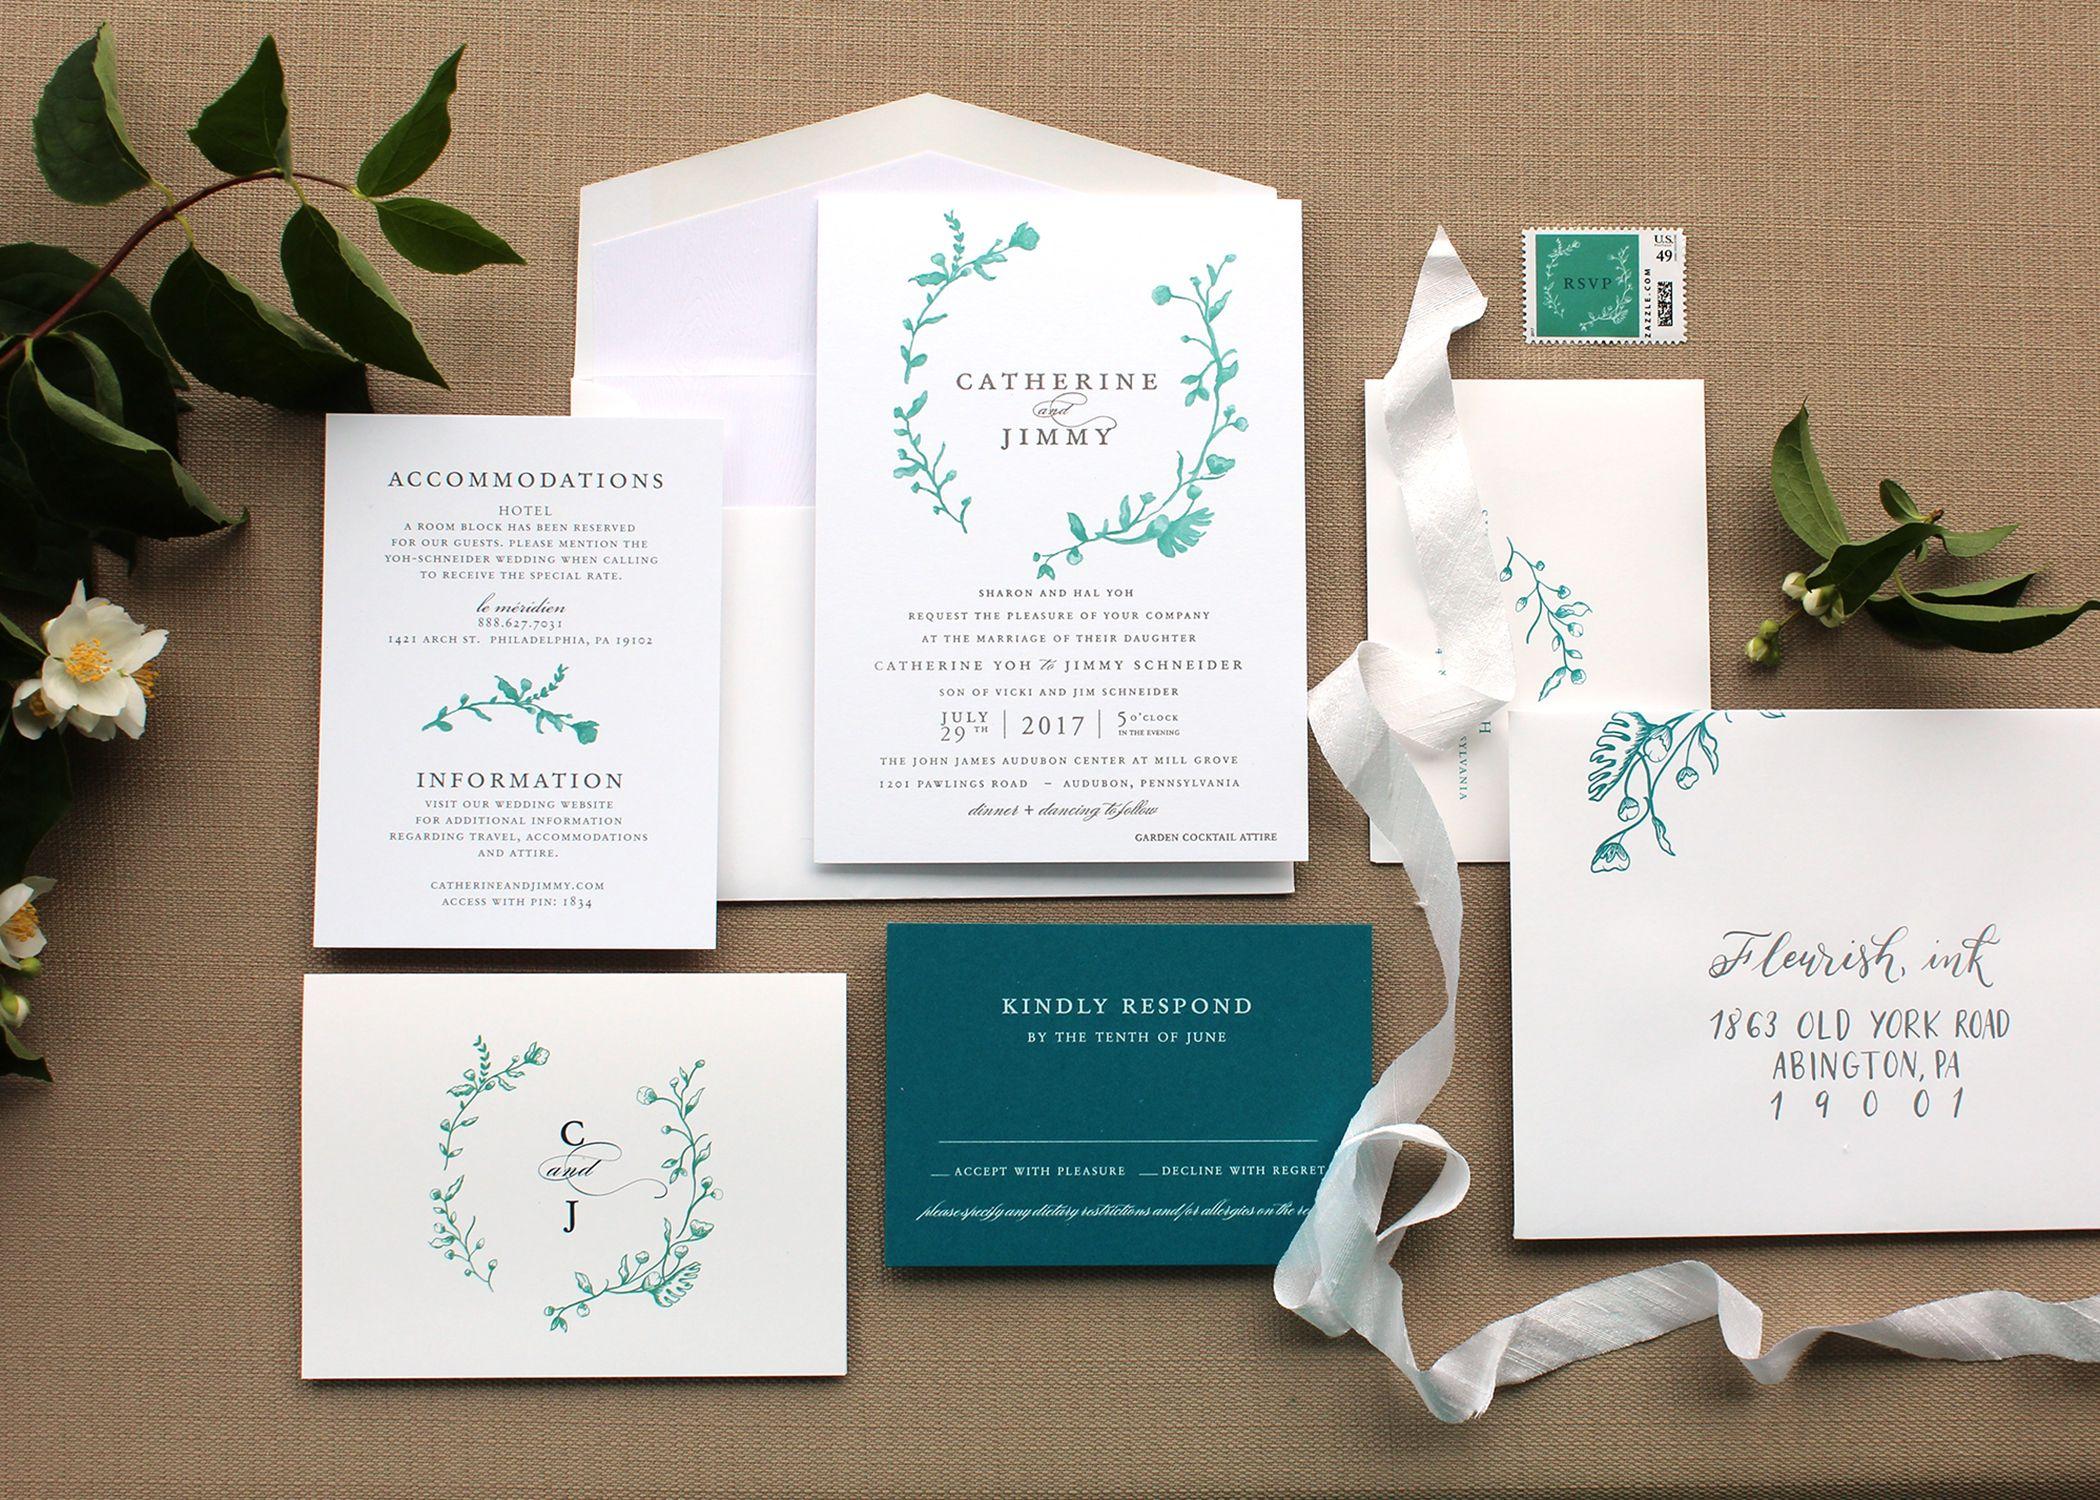 information on wedding invitation examples%0A Designed by Fleurish ink   Wedding Invitation  Custom Design  Watercolor   Letterpress